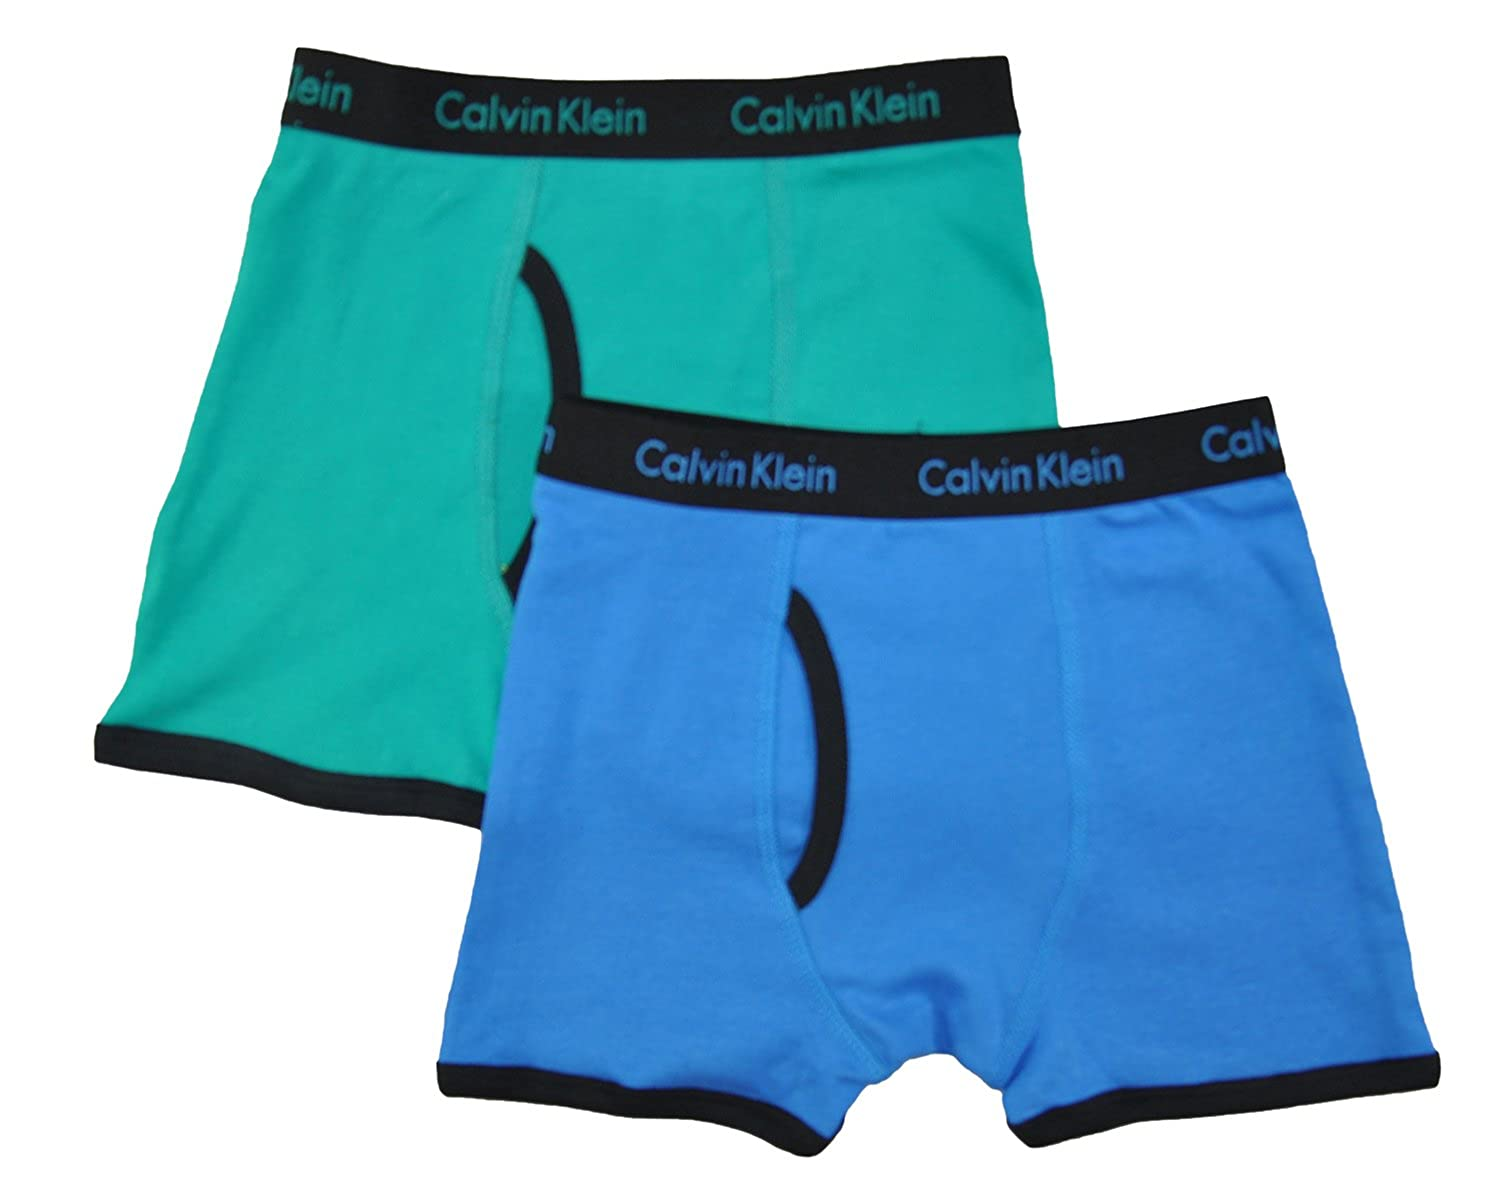 Calvin Klein Little/Big Boys' Assorted Boxer Briefs (Pack of 2), Blue/Teal ,6/7